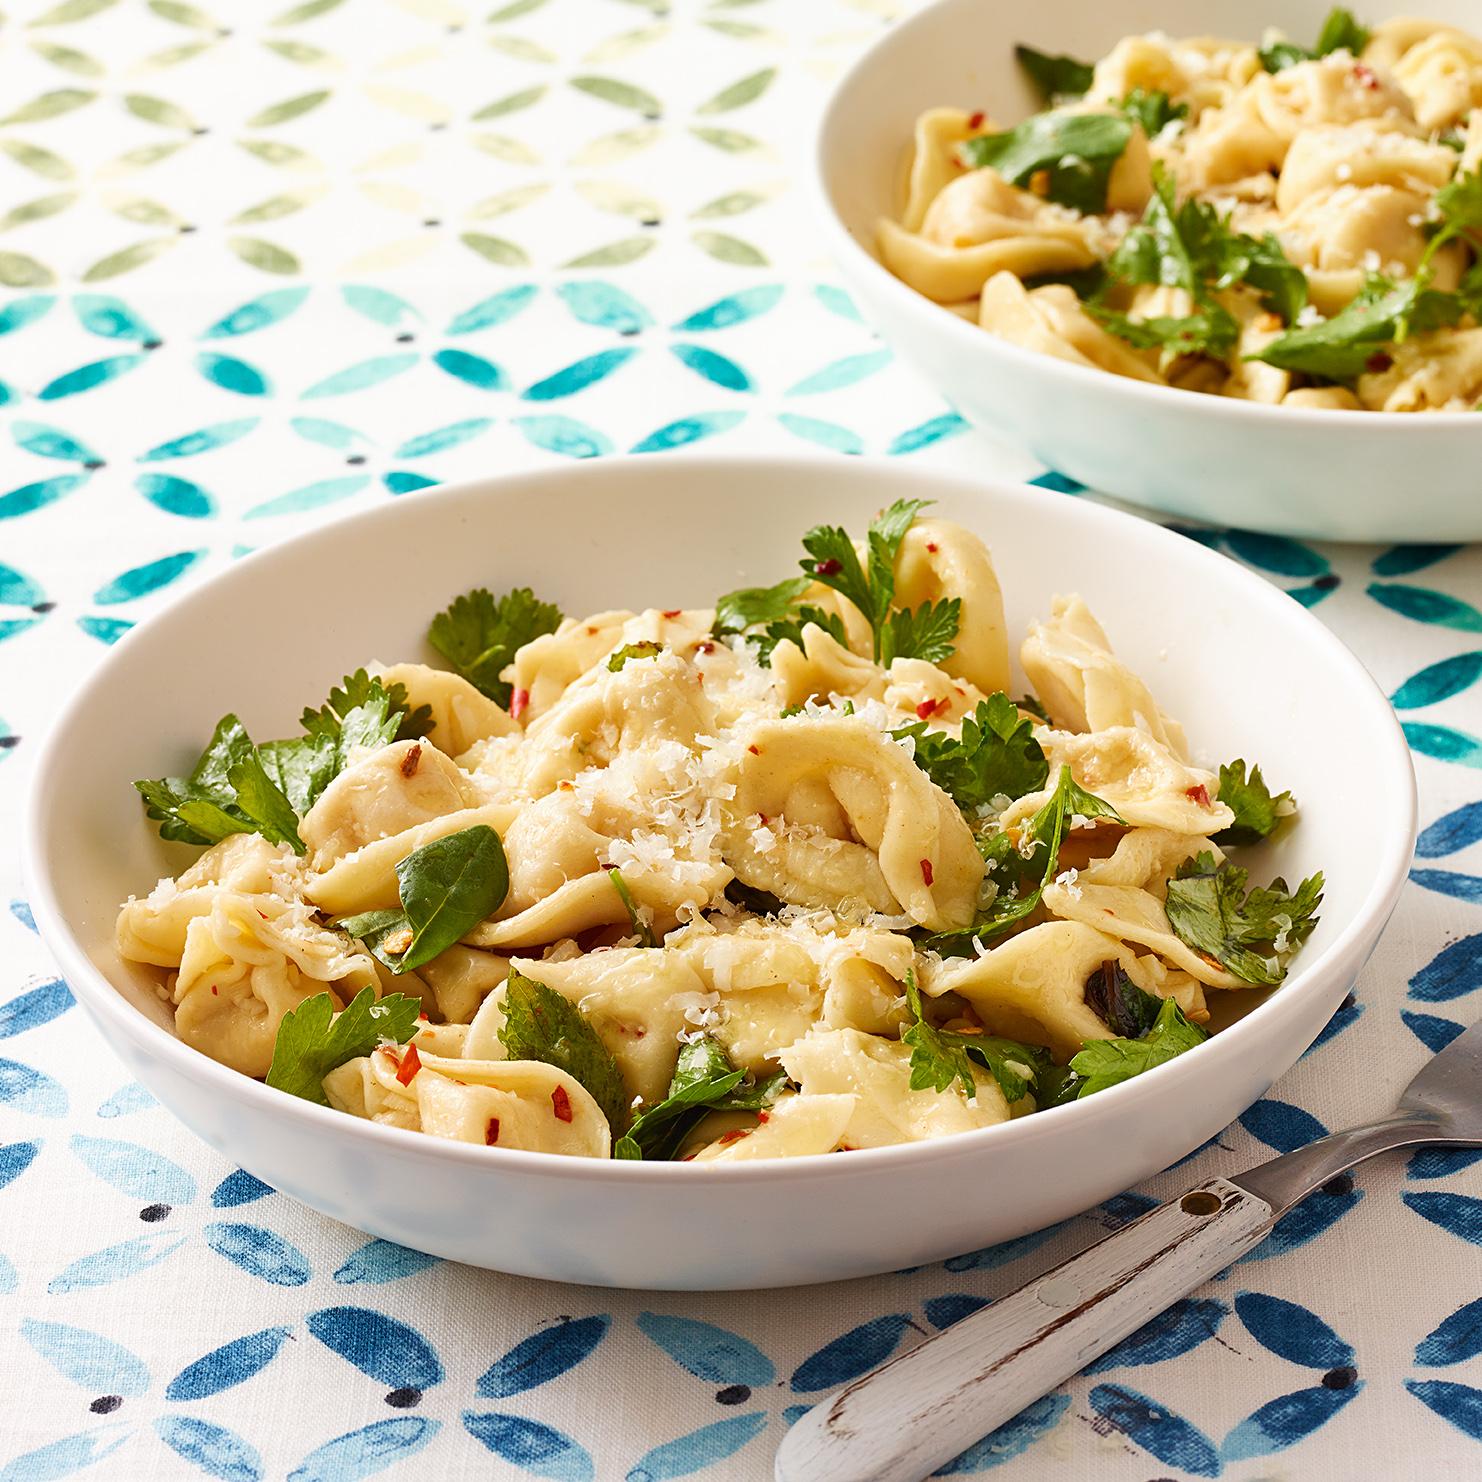 Cheese Tortellini with Herbs & Garlic